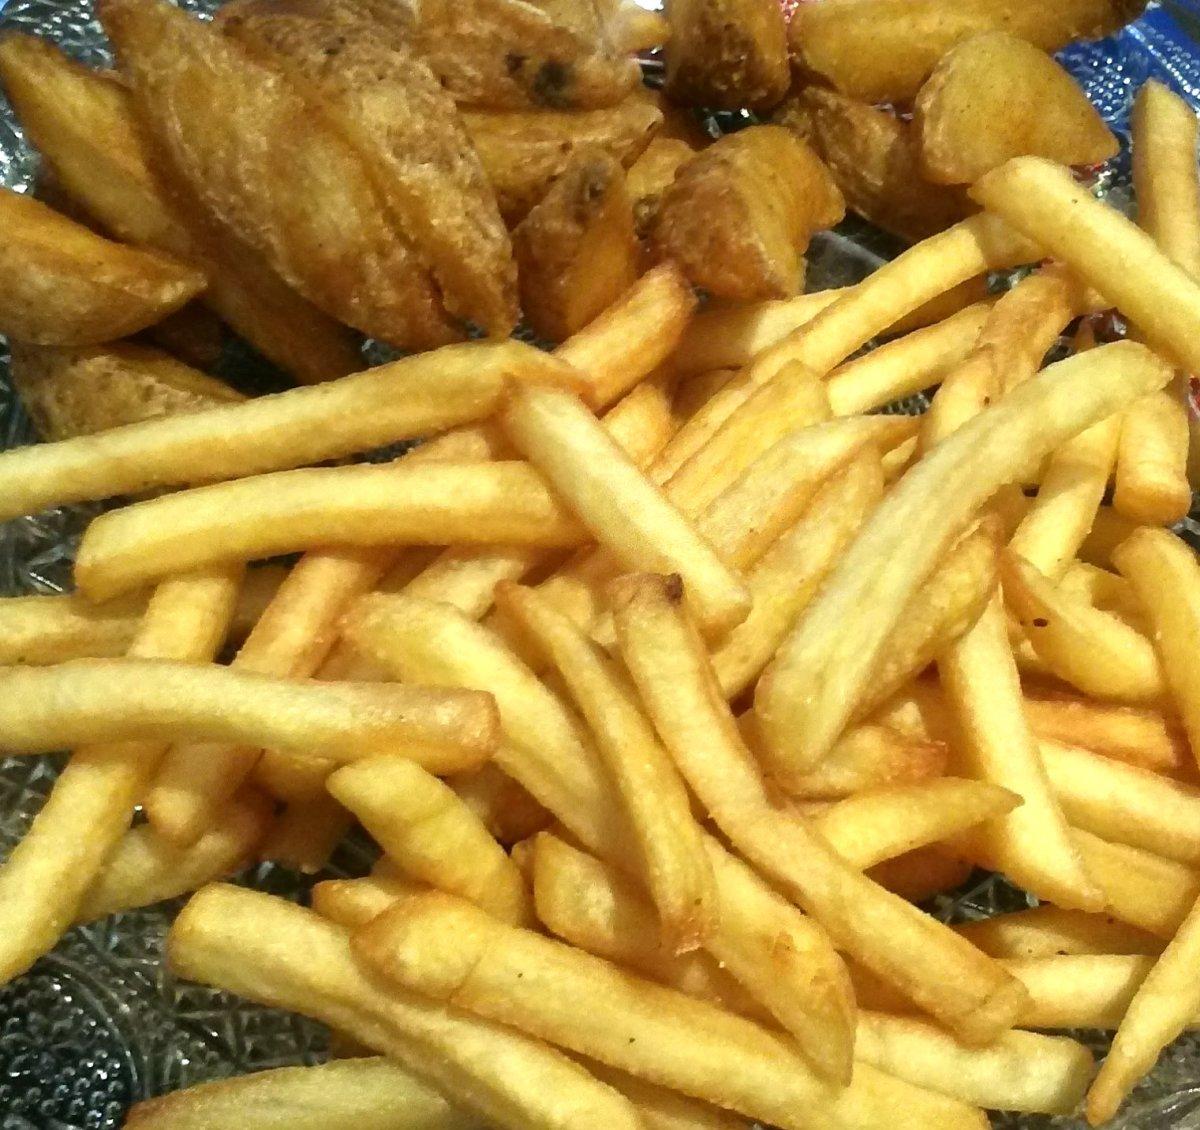 frites-potatoes-happy-burger-restaurant-fast-food-hossegor